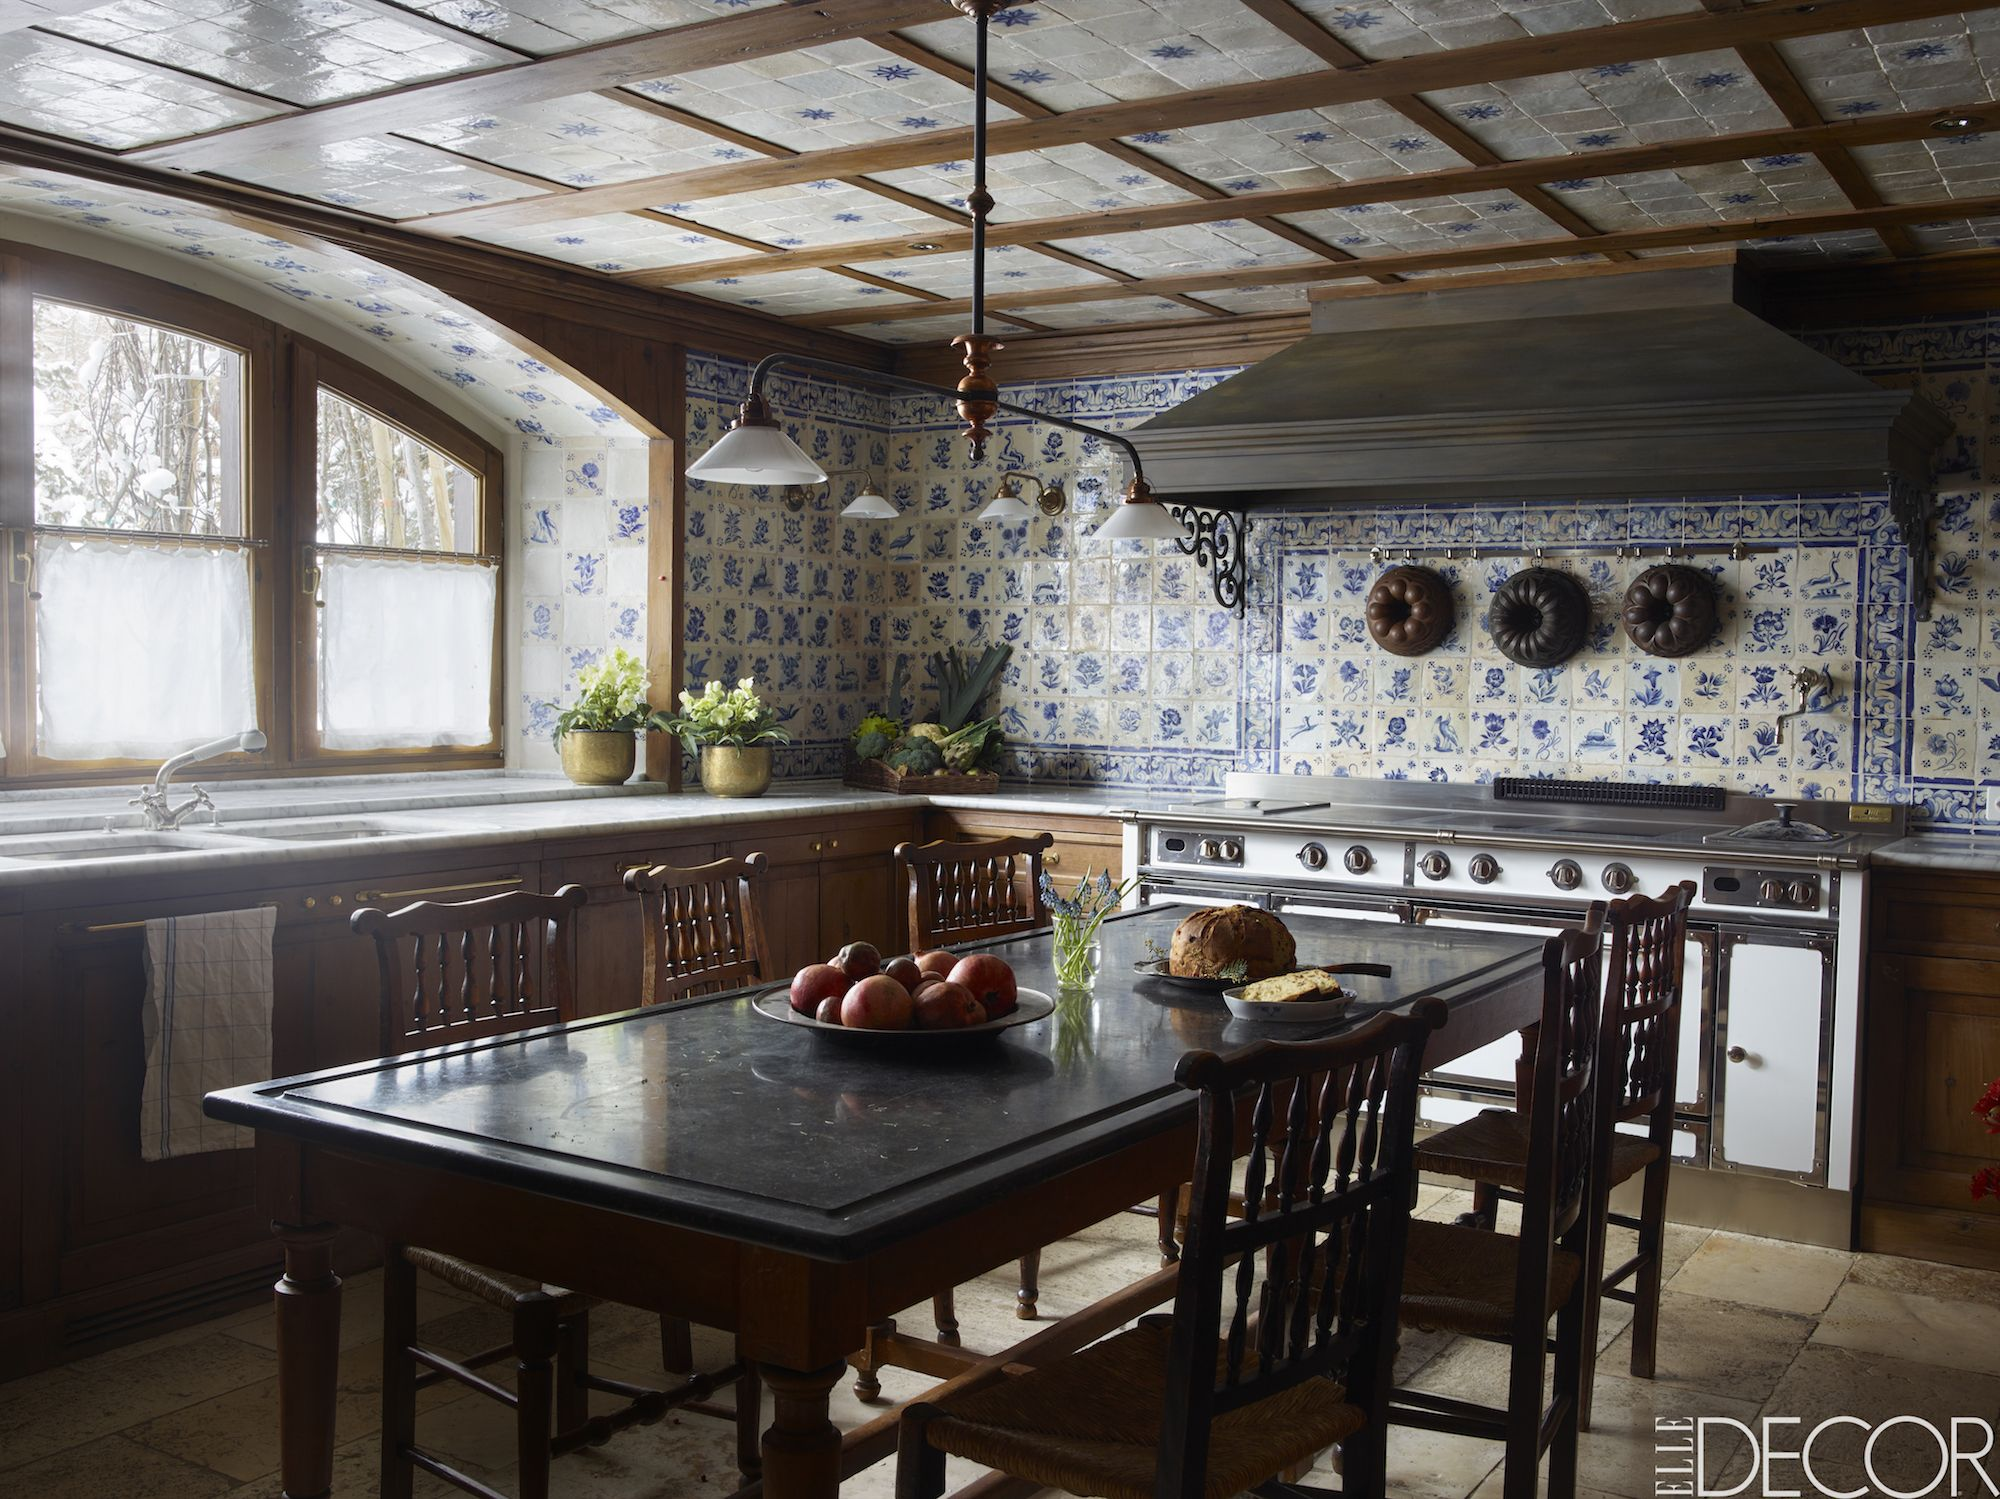 9 Gorgeous Kitchen Tile Backsplashes - Best Kitchen Tile Ideas